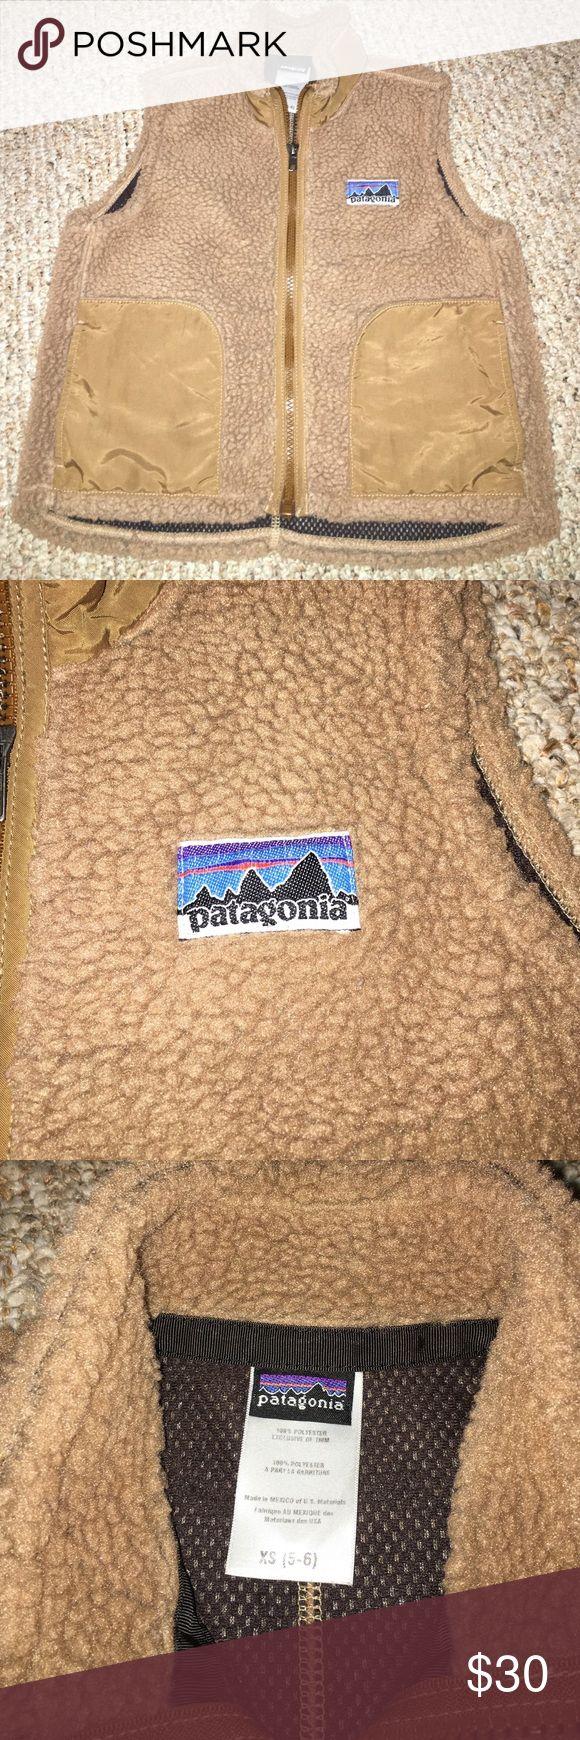 Patagonia Fleece Vest GUC. Caramel color. Size XS (5-6). A bit worn at the arm holes. Patagonia Jackets & Coats Vests